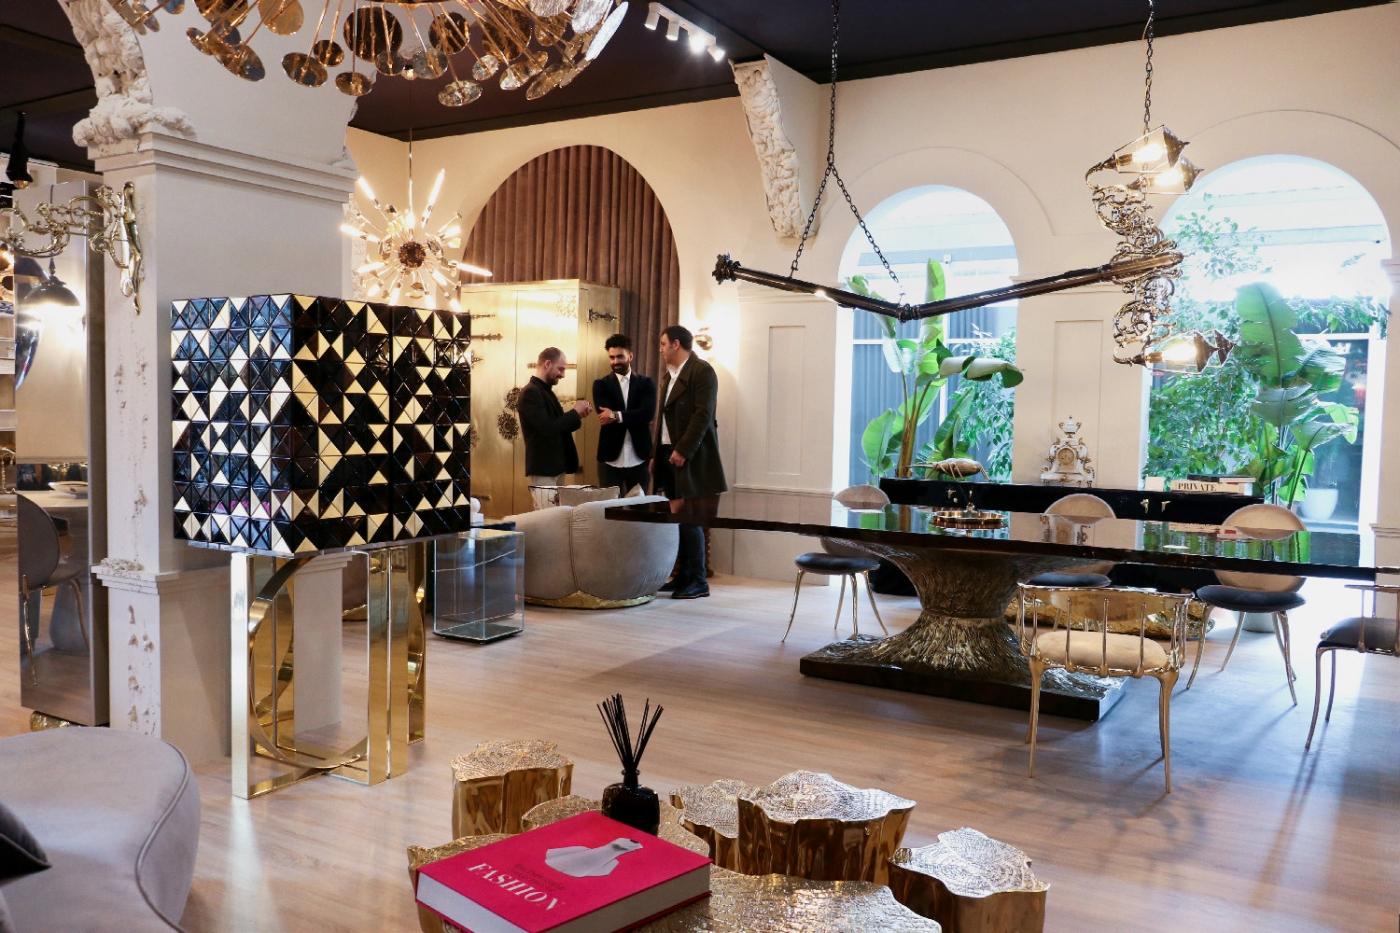 boca do lobo Boca do Lobo: The Art of Designing & Craft at Salone del Mobile 2019 Featured 1400x933